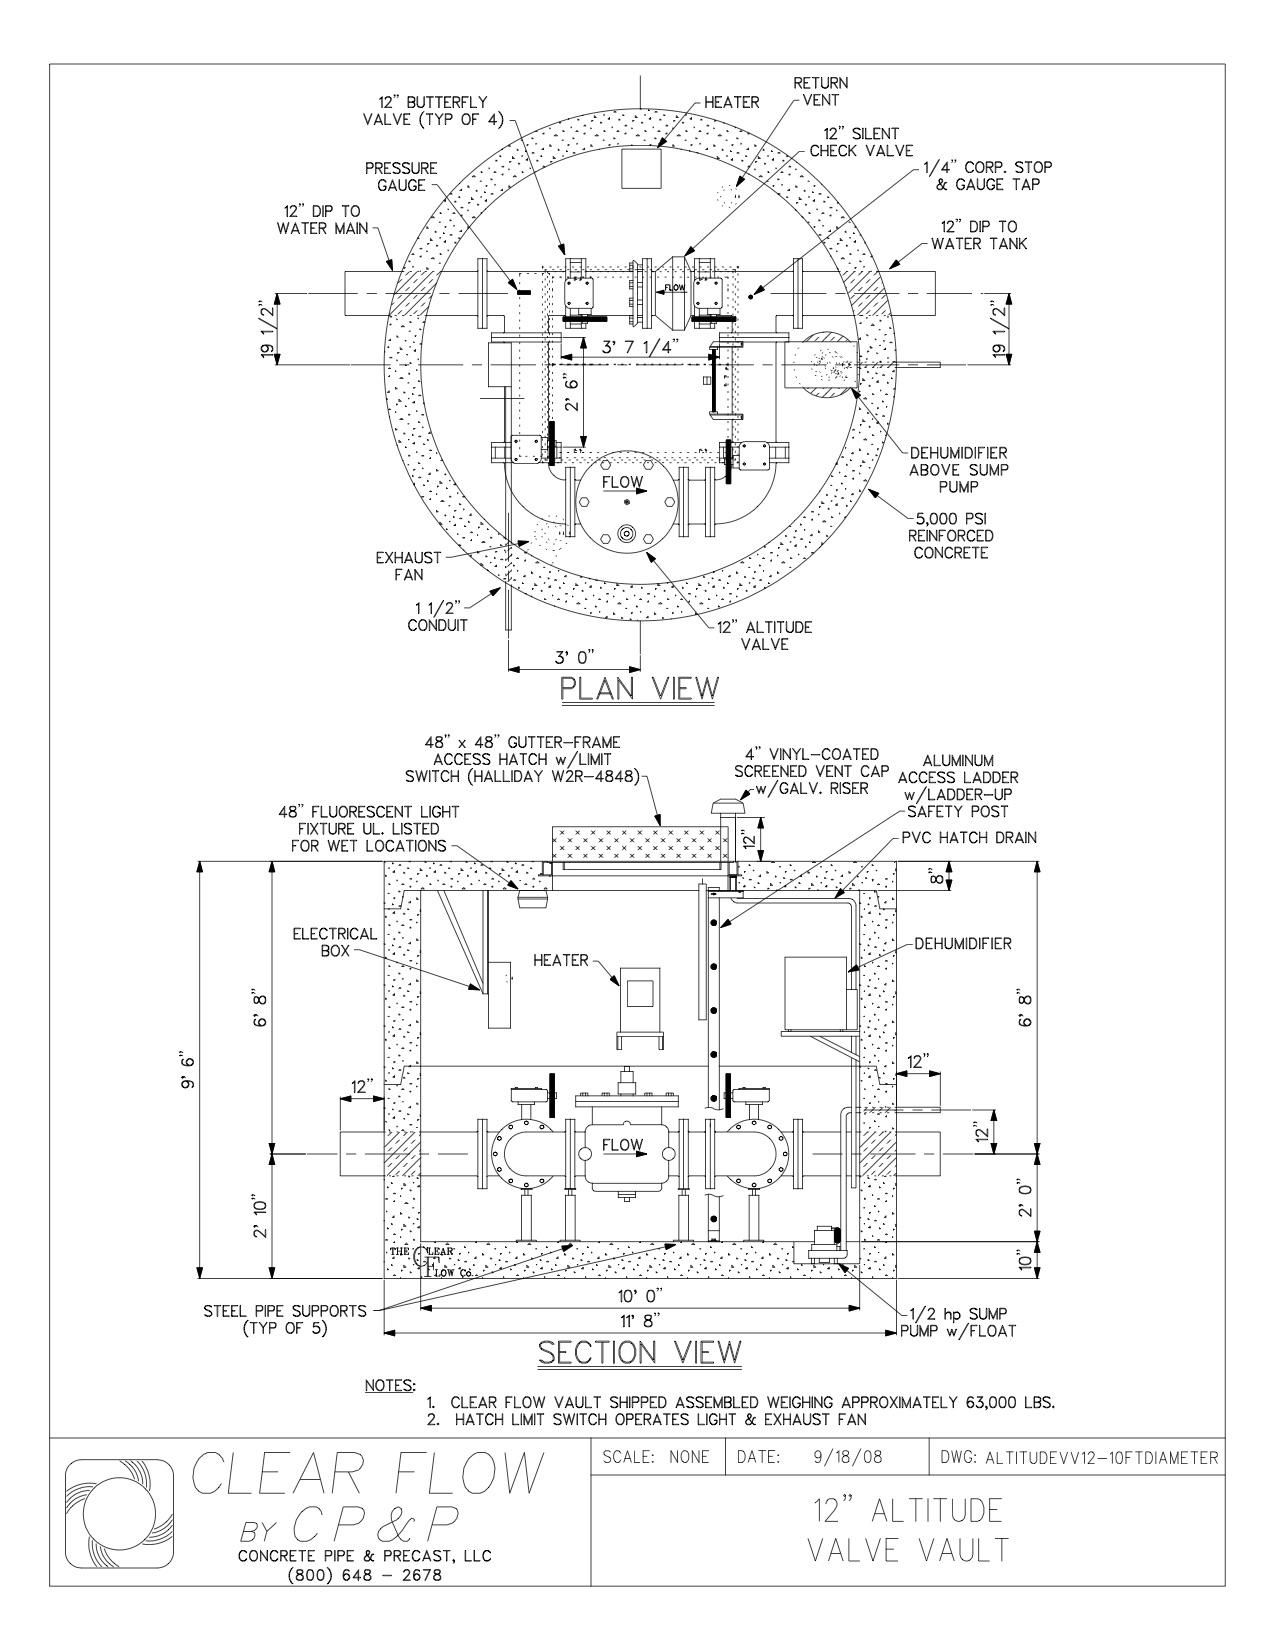 1275x1650 Concrete Pipe Amp Precast Drawings